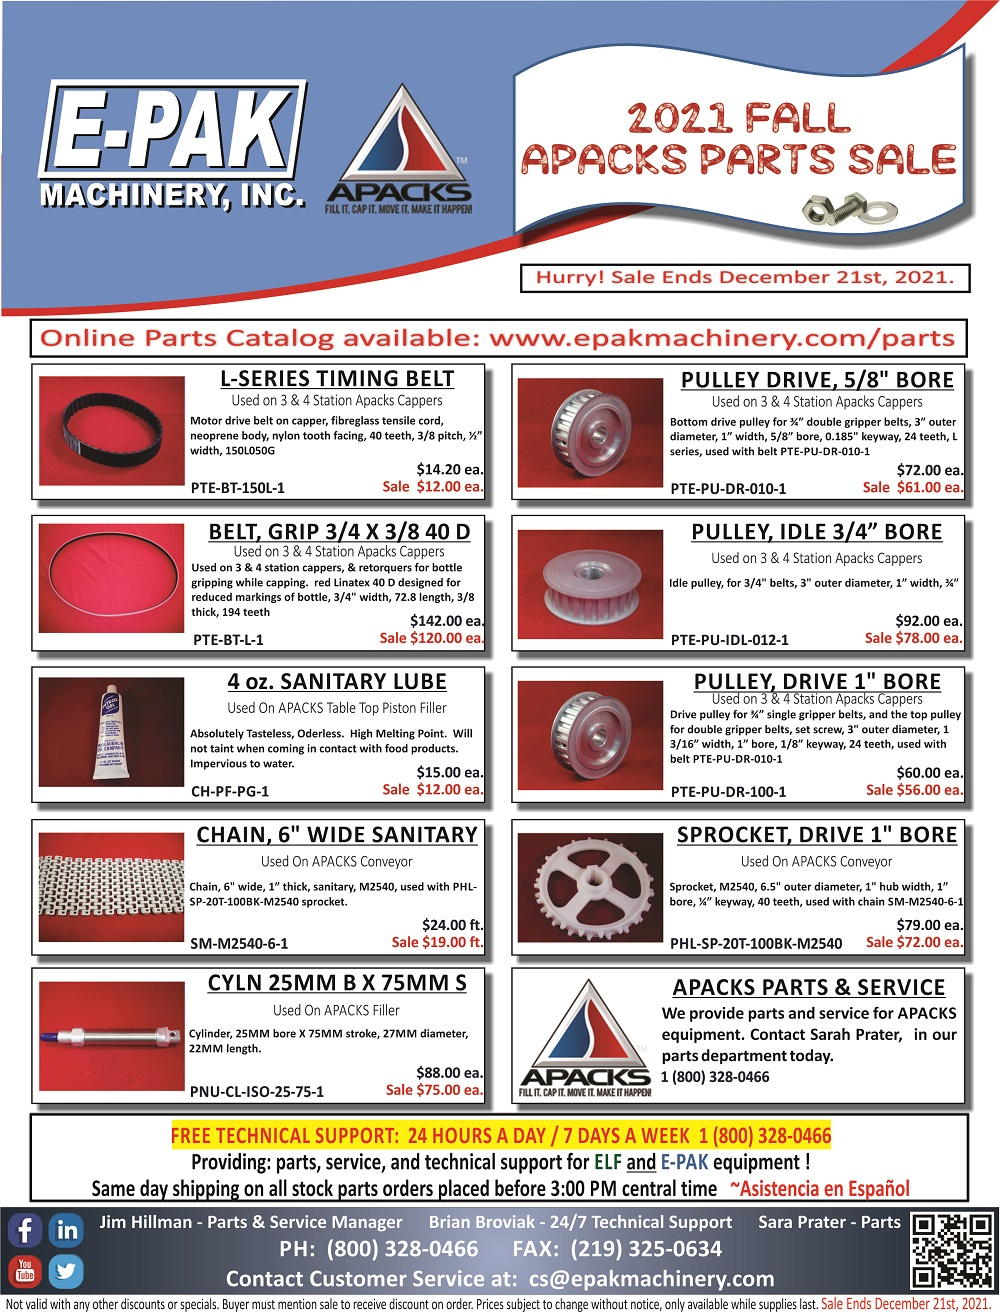 apacks-parts-sale-flyer-fall-2021.jpg